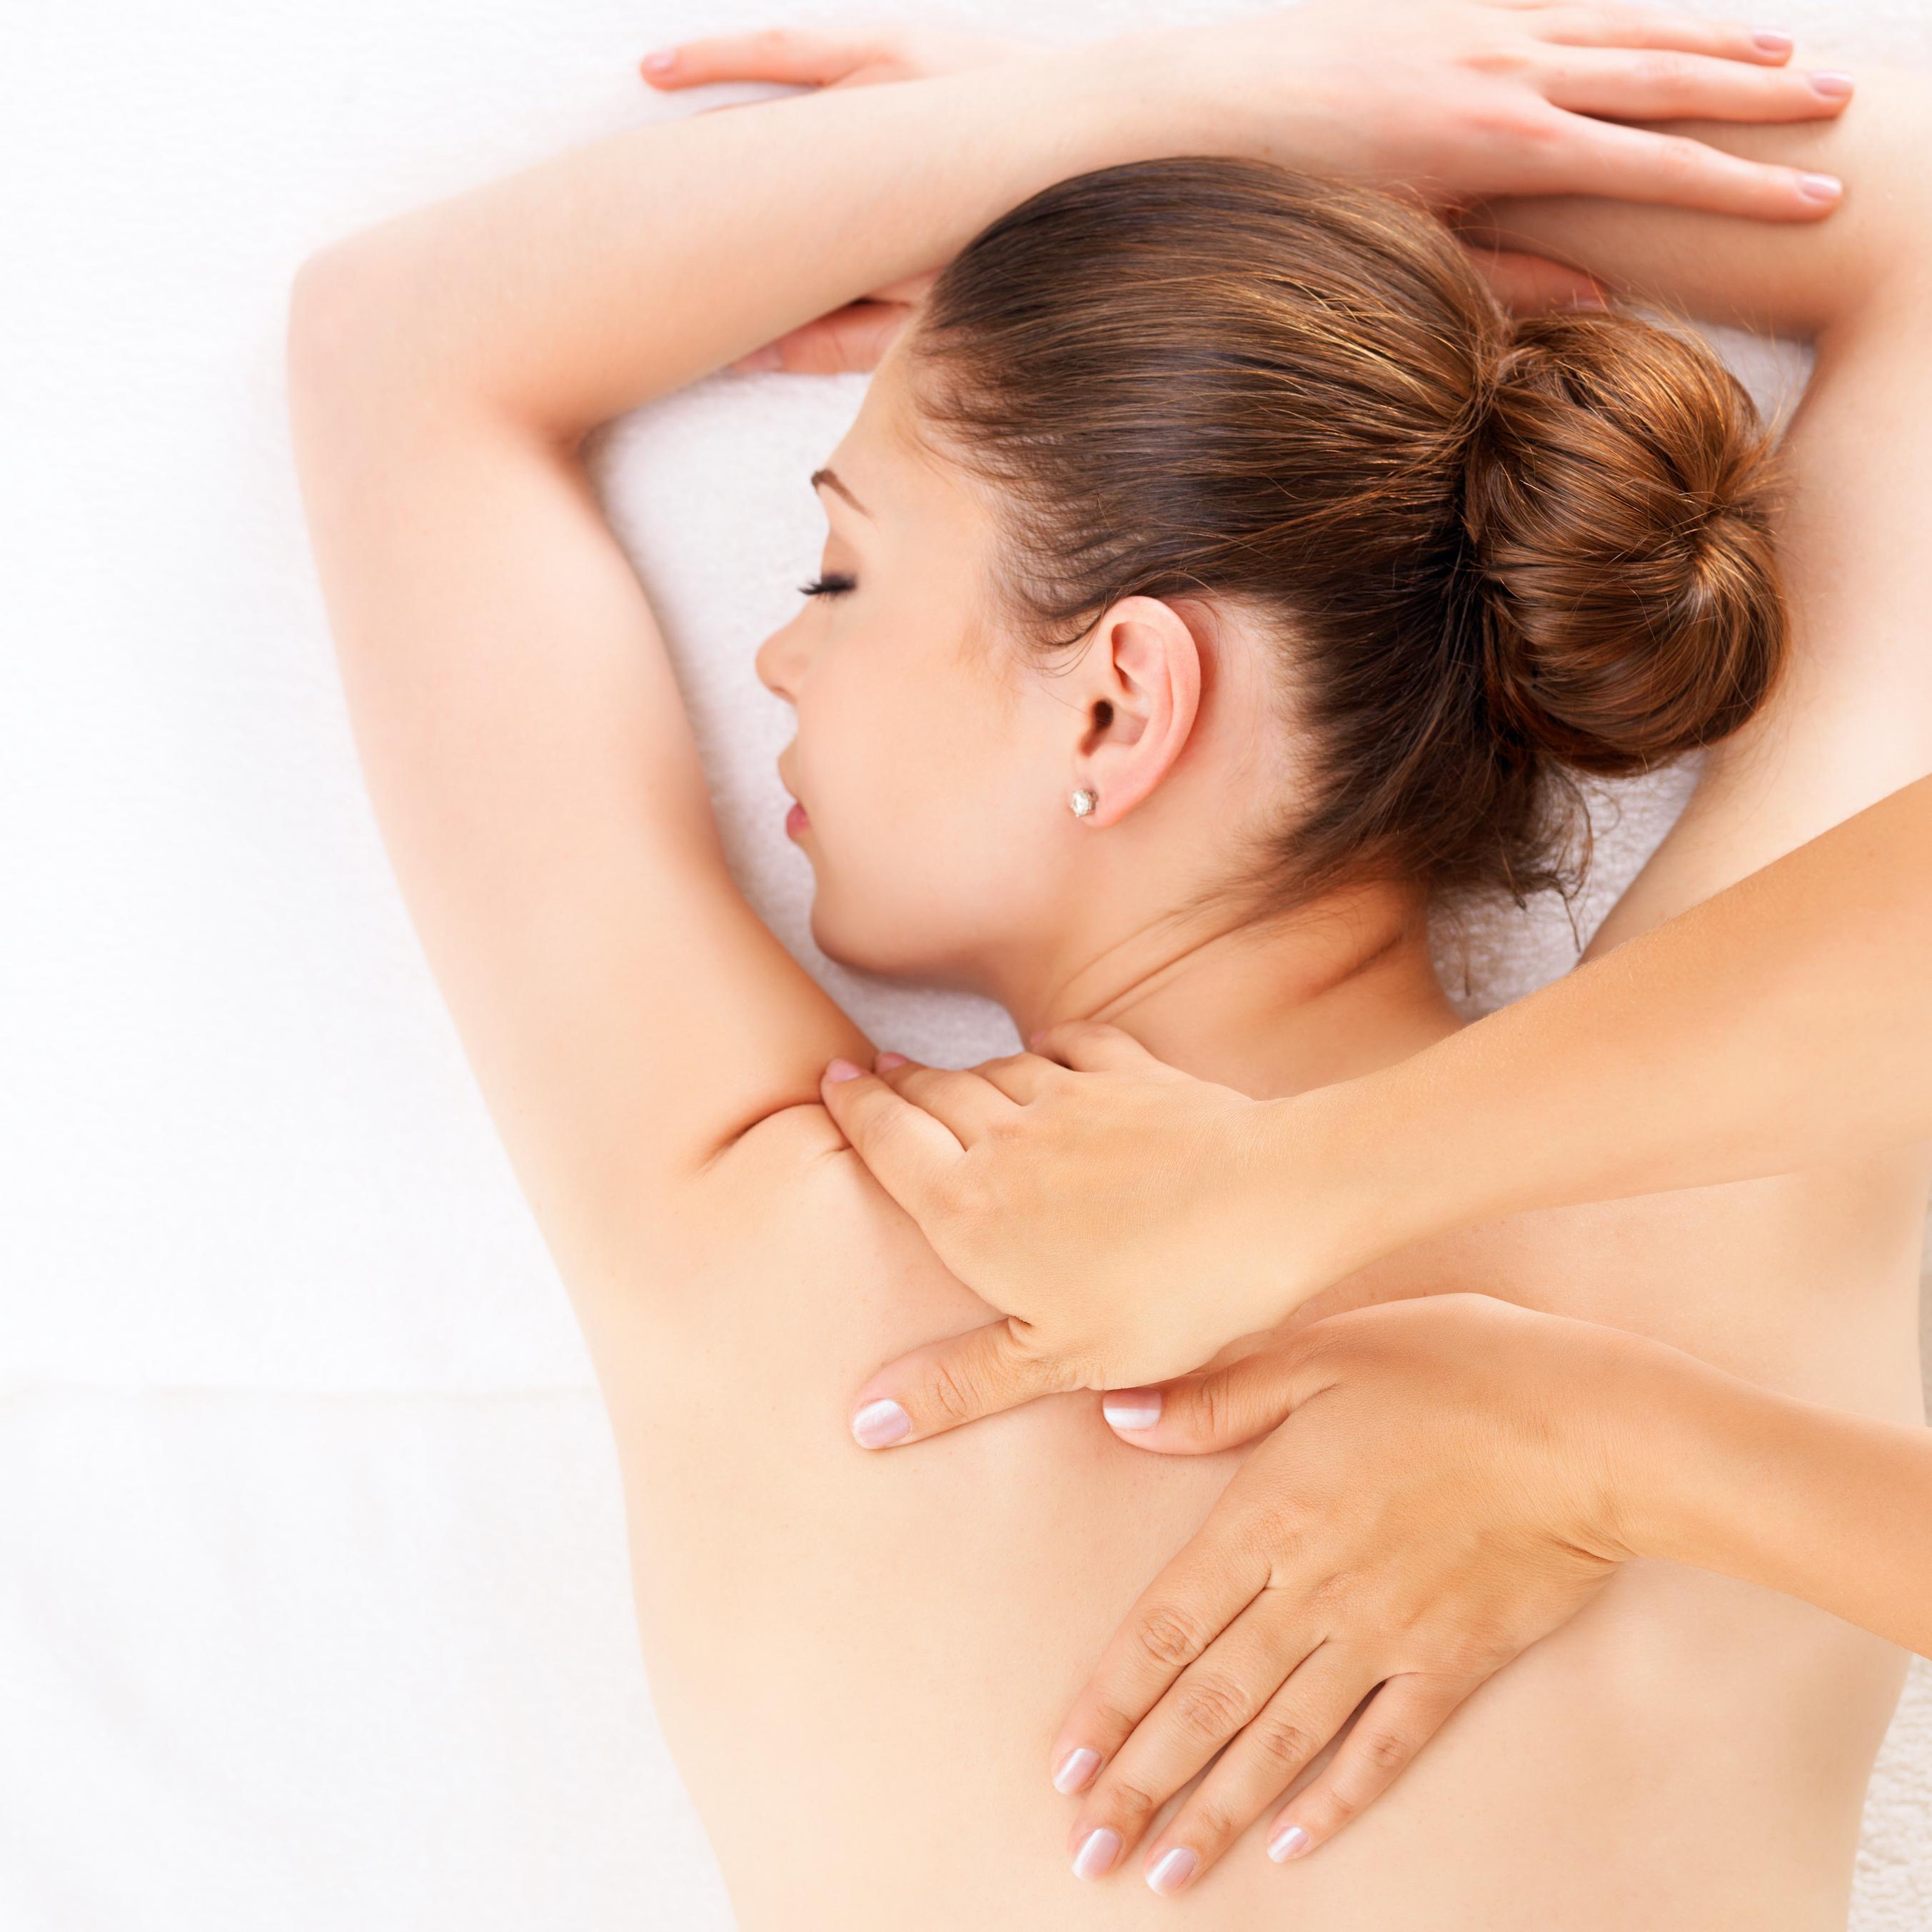 woman getting massage spa 6th